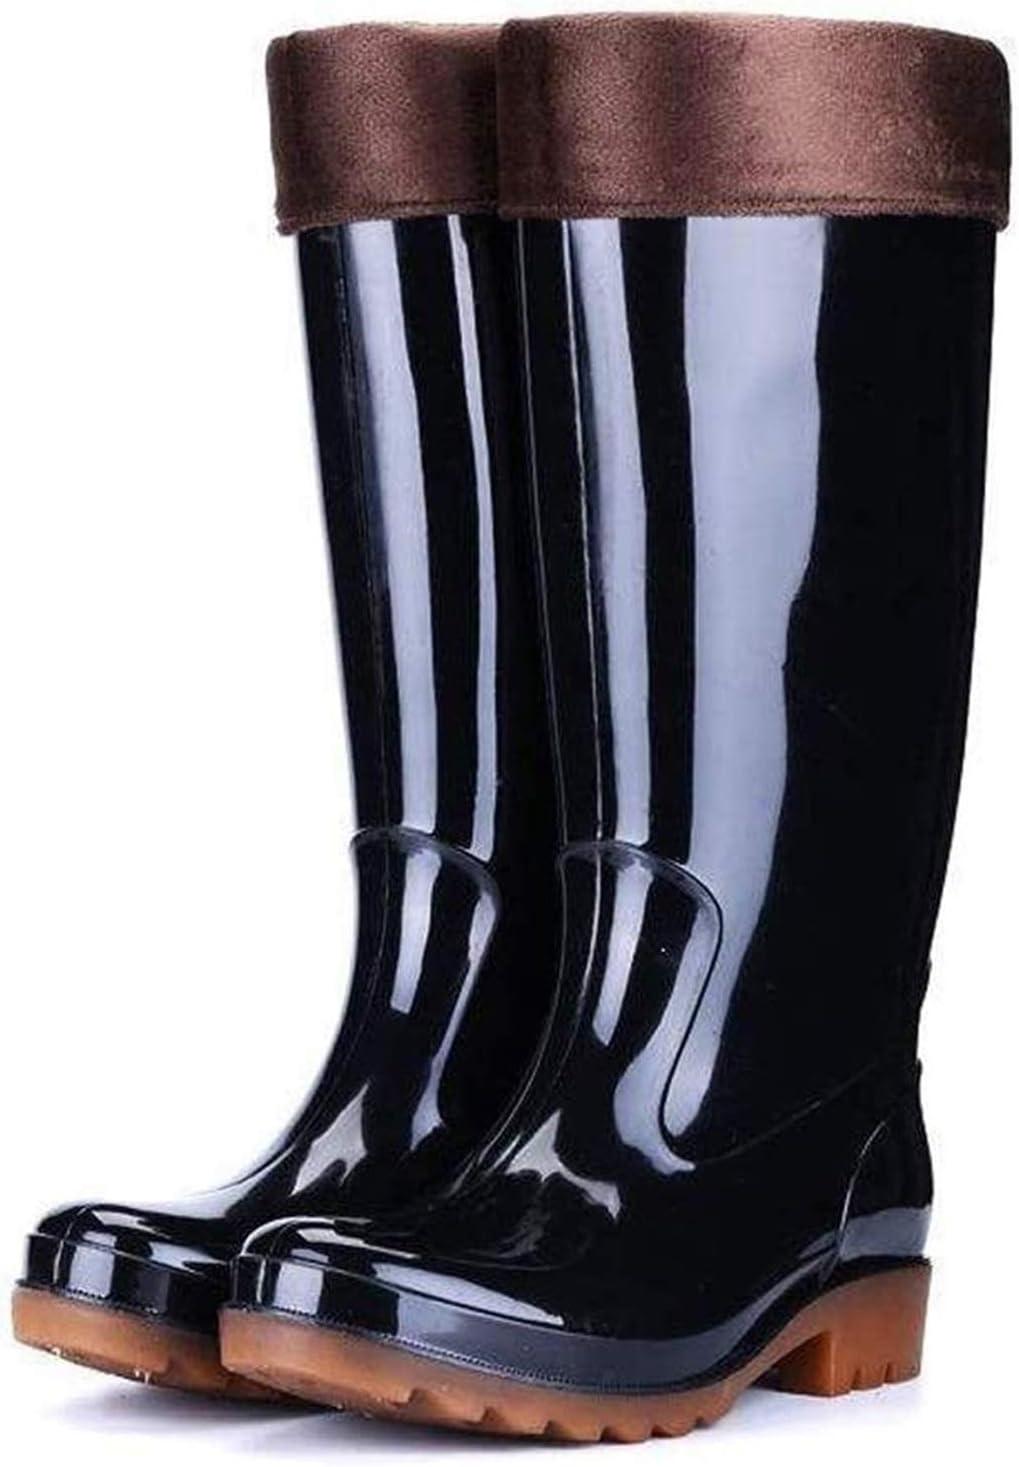 Boston Mall YUESFZ rain Boots ! Super beauty product restock quality top! Men's Tall Work Rain Outdoor Black Tube